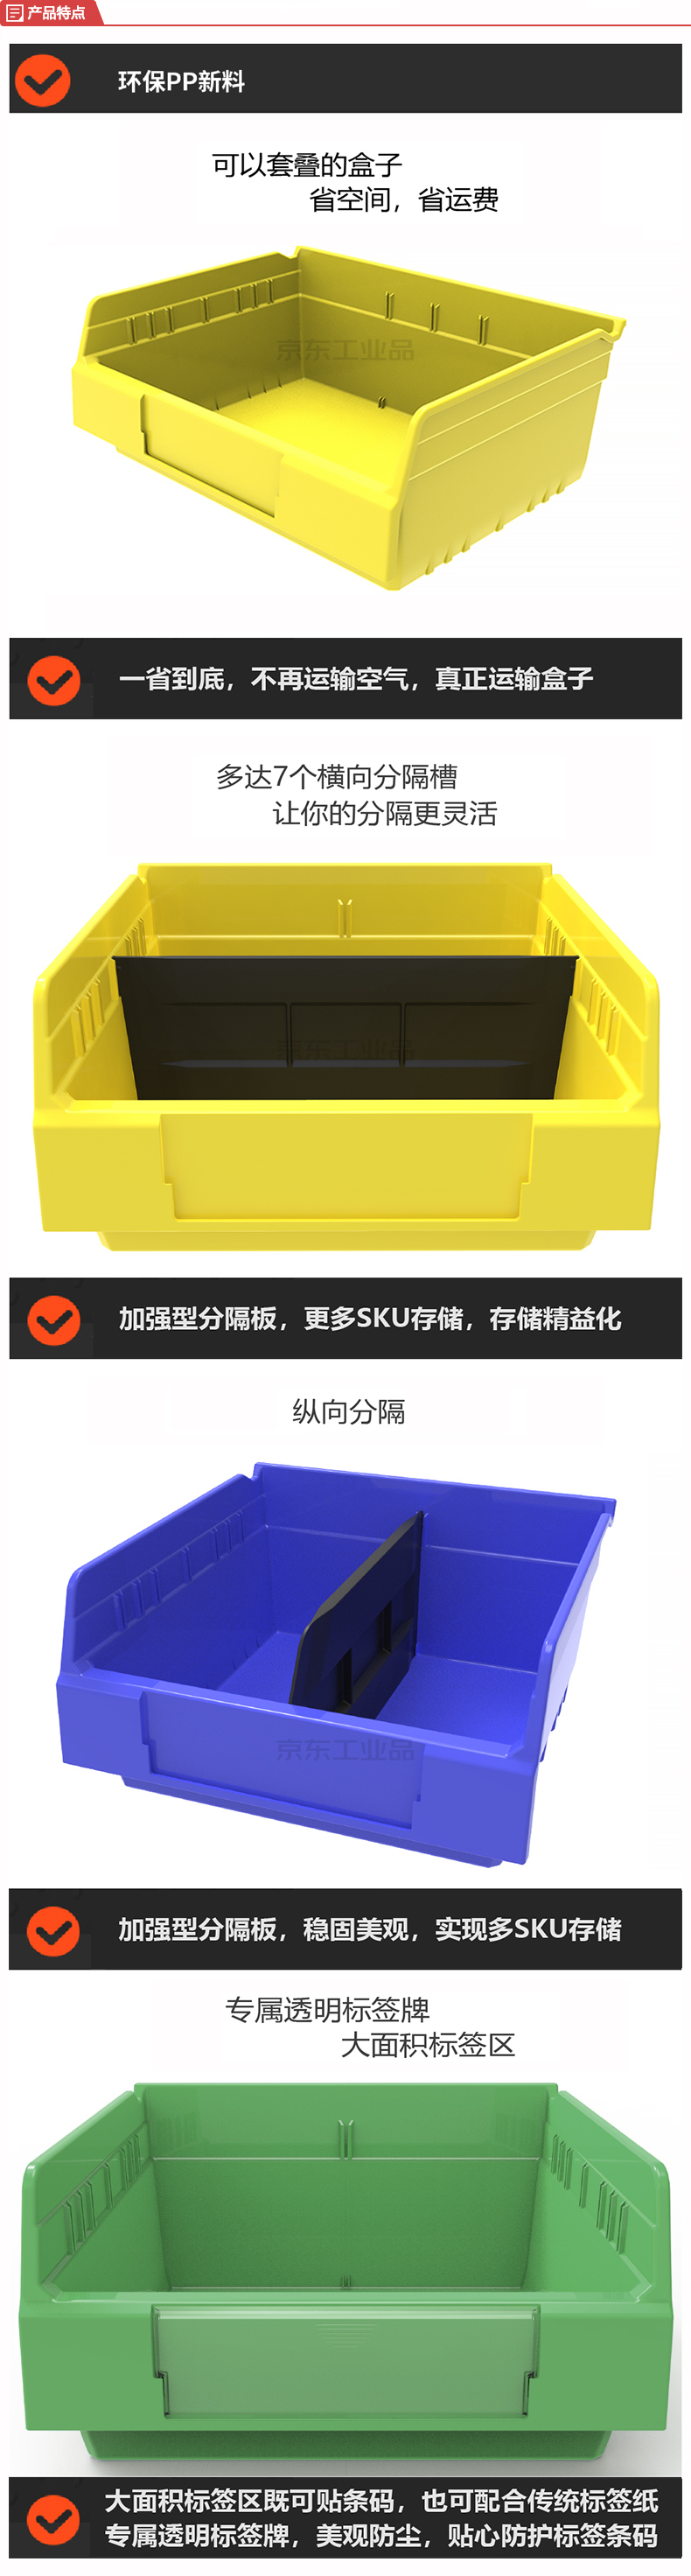 鼎王/TRIPOD KING 精益物料盒300*400*150mm;TK3415黄